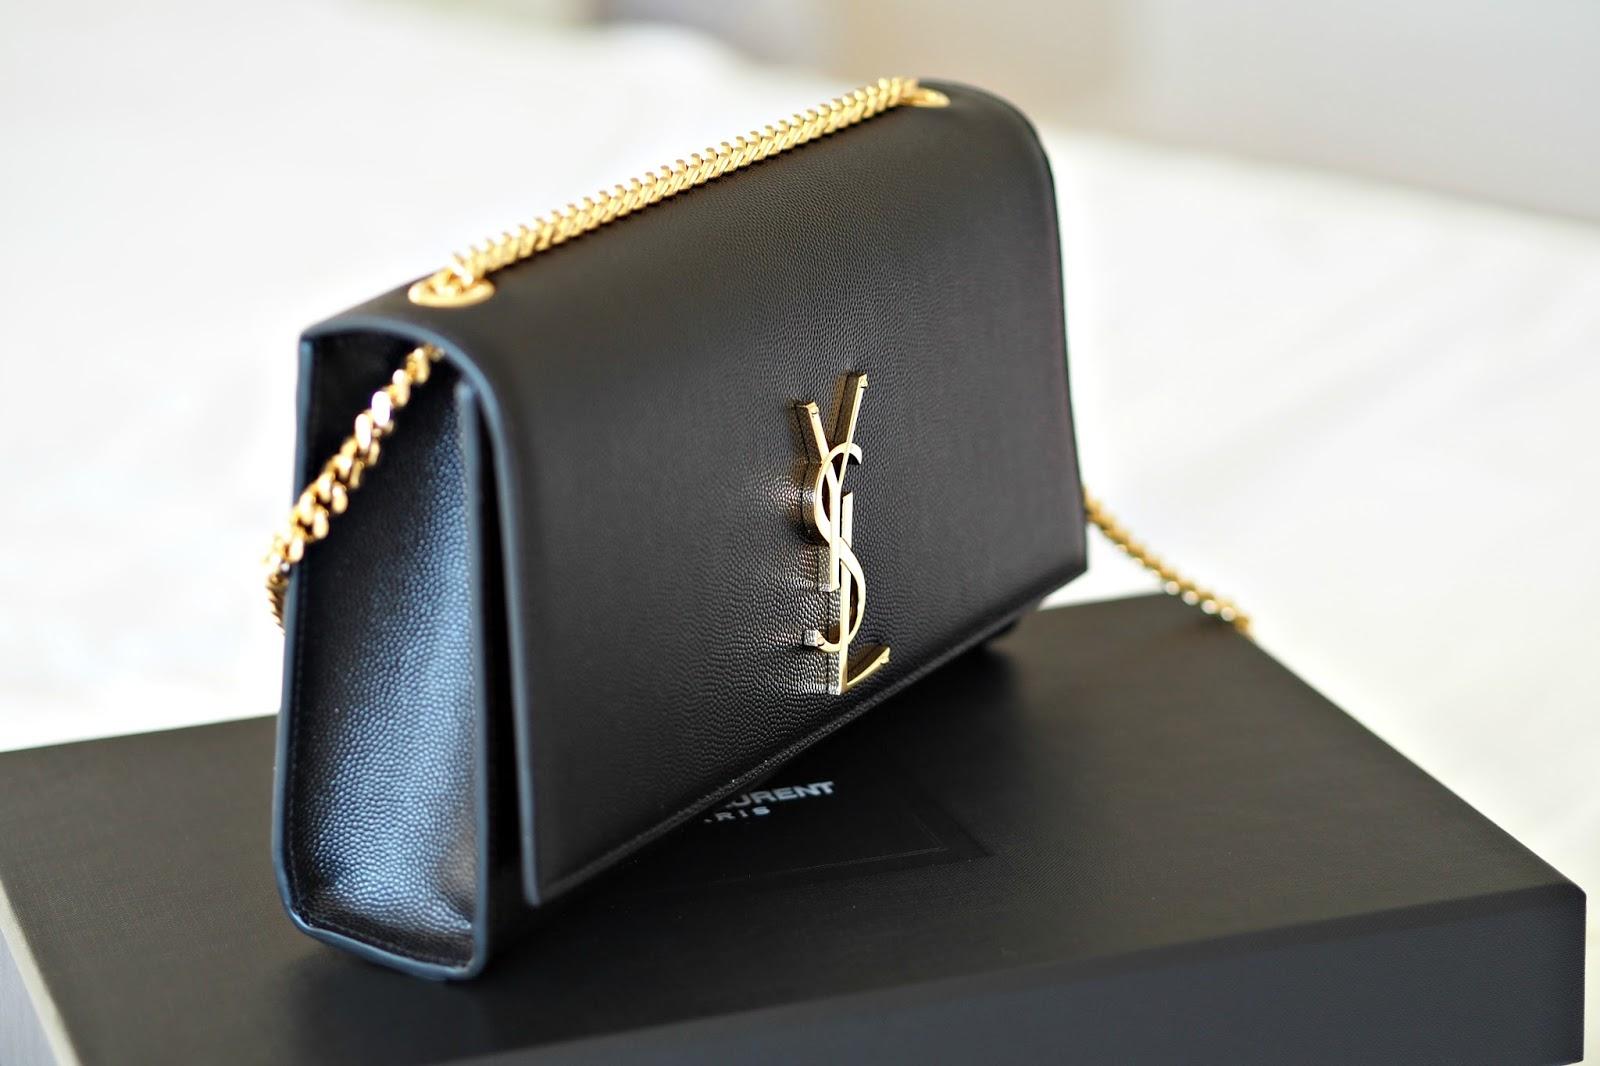 Saint Laurent Classic Medium Kate Monogram Handbag in black, bond street